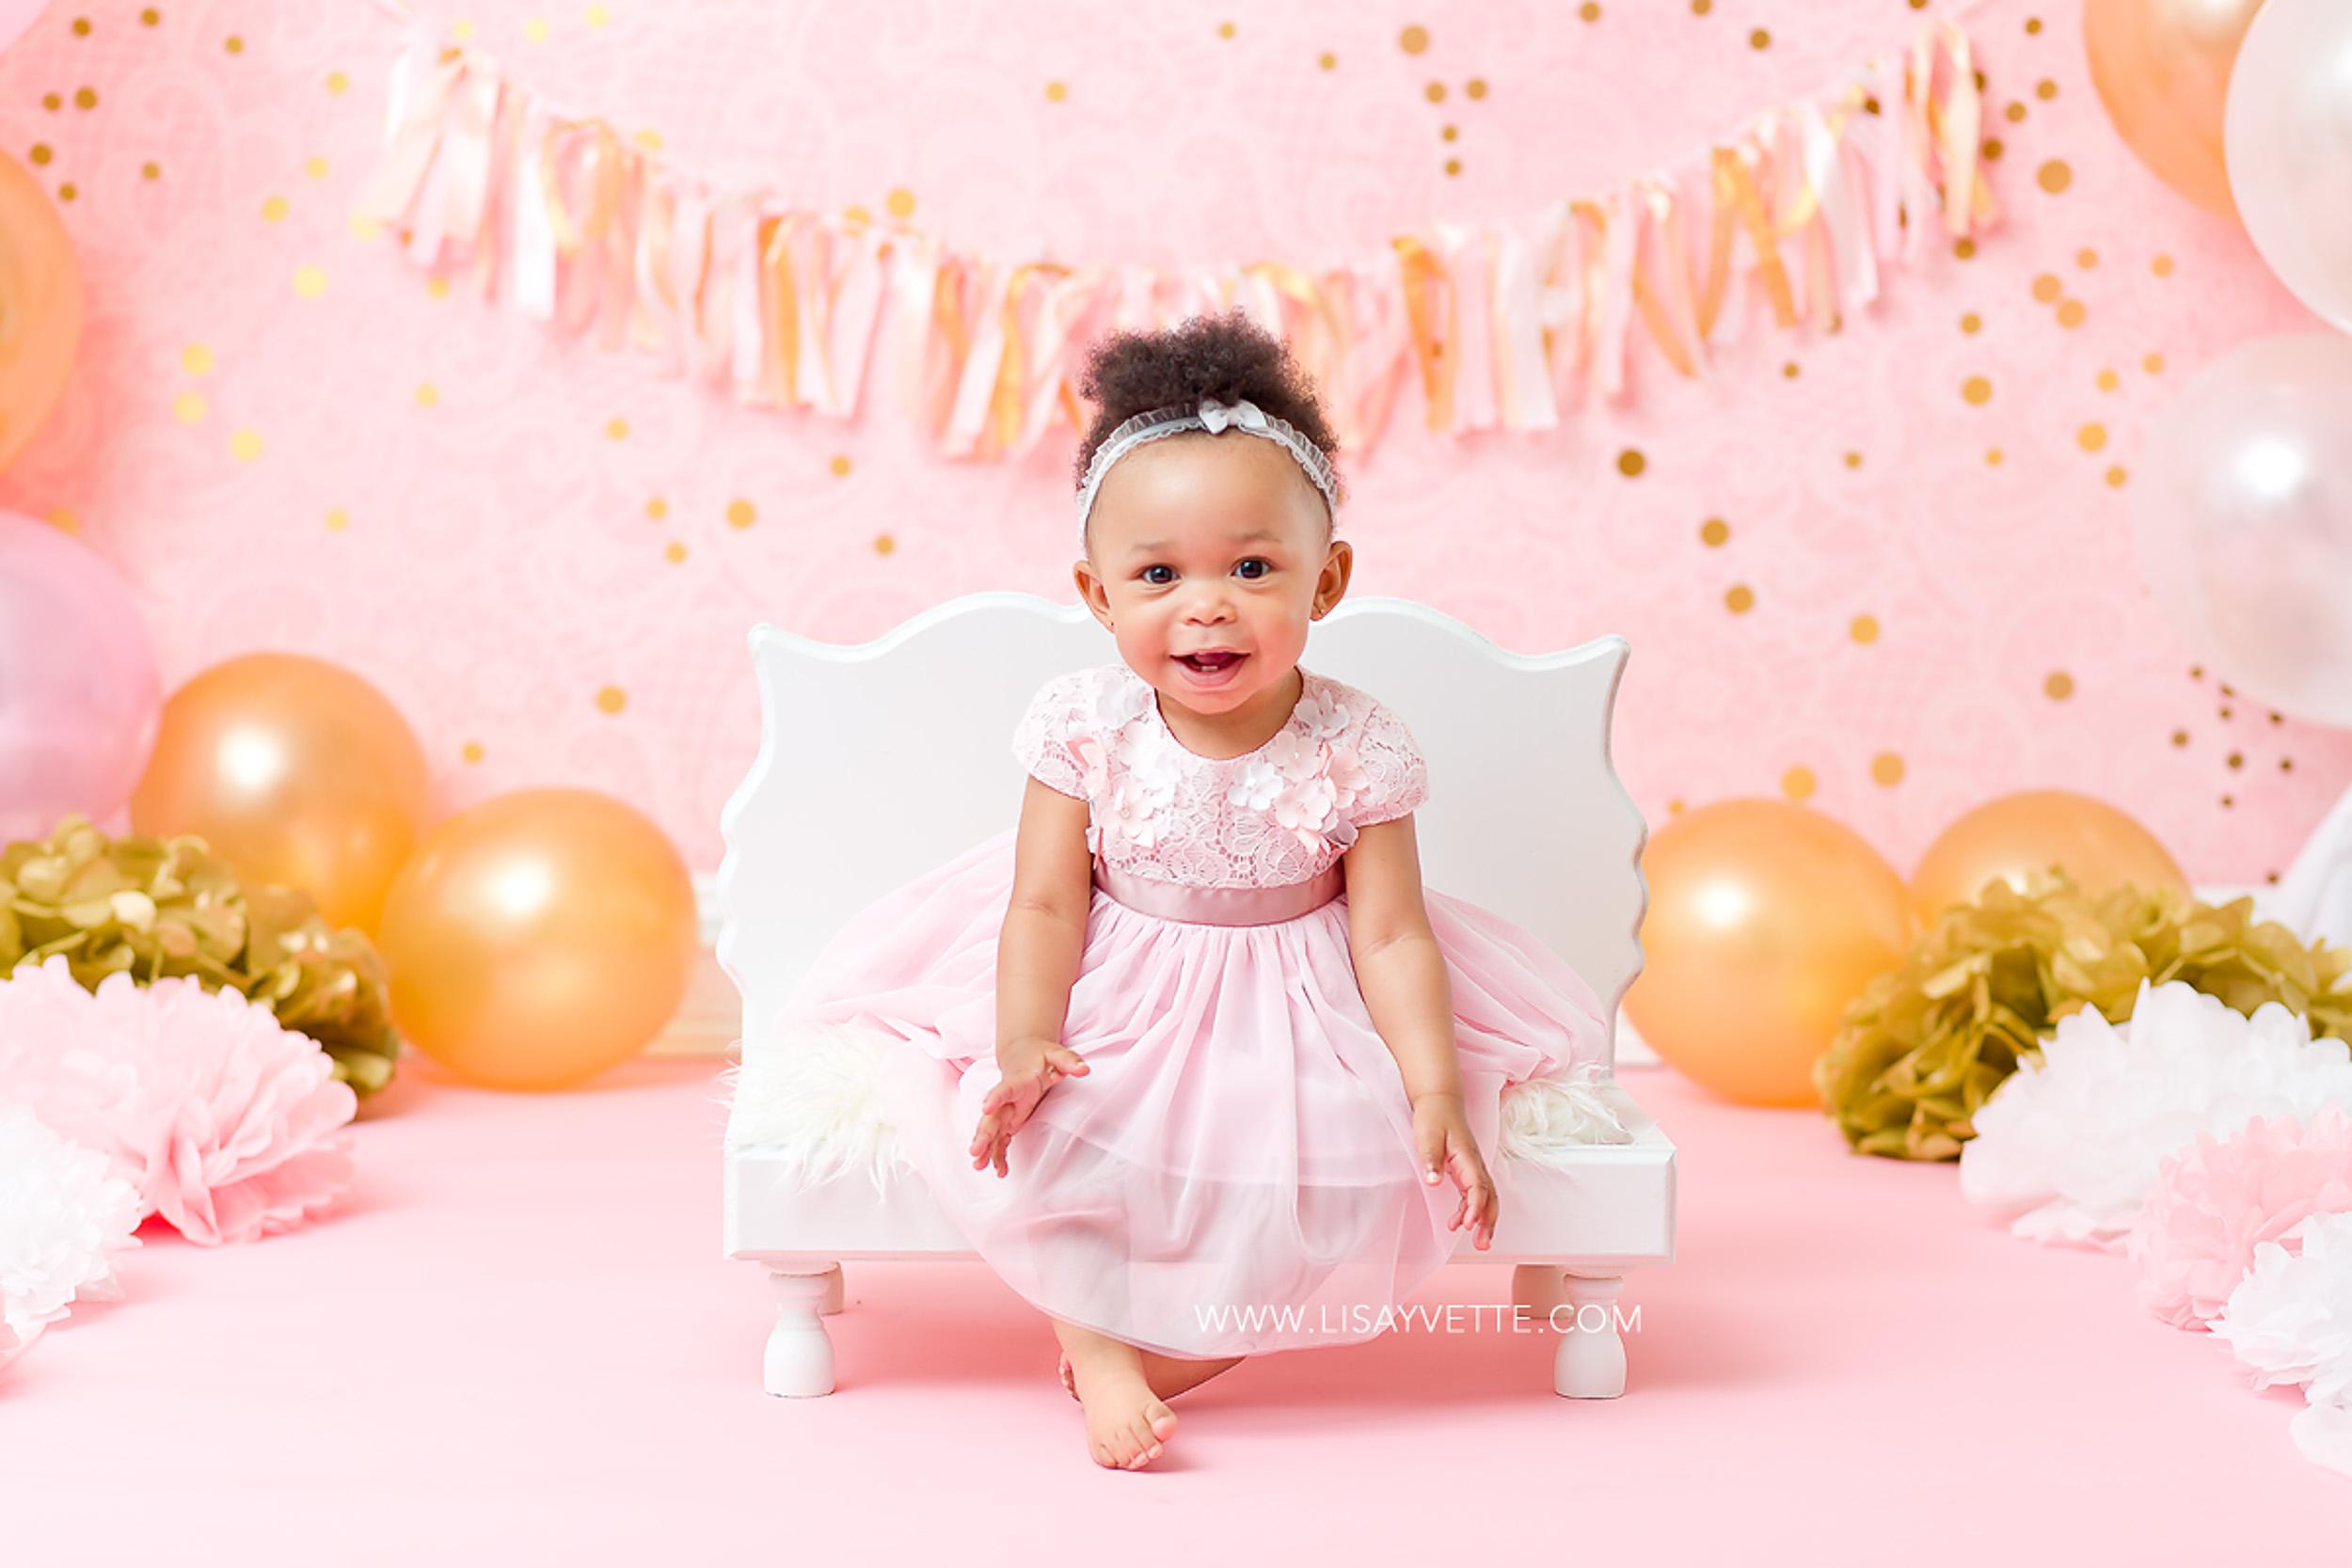 charlotte-nc-baby-photographer-1012.jpg